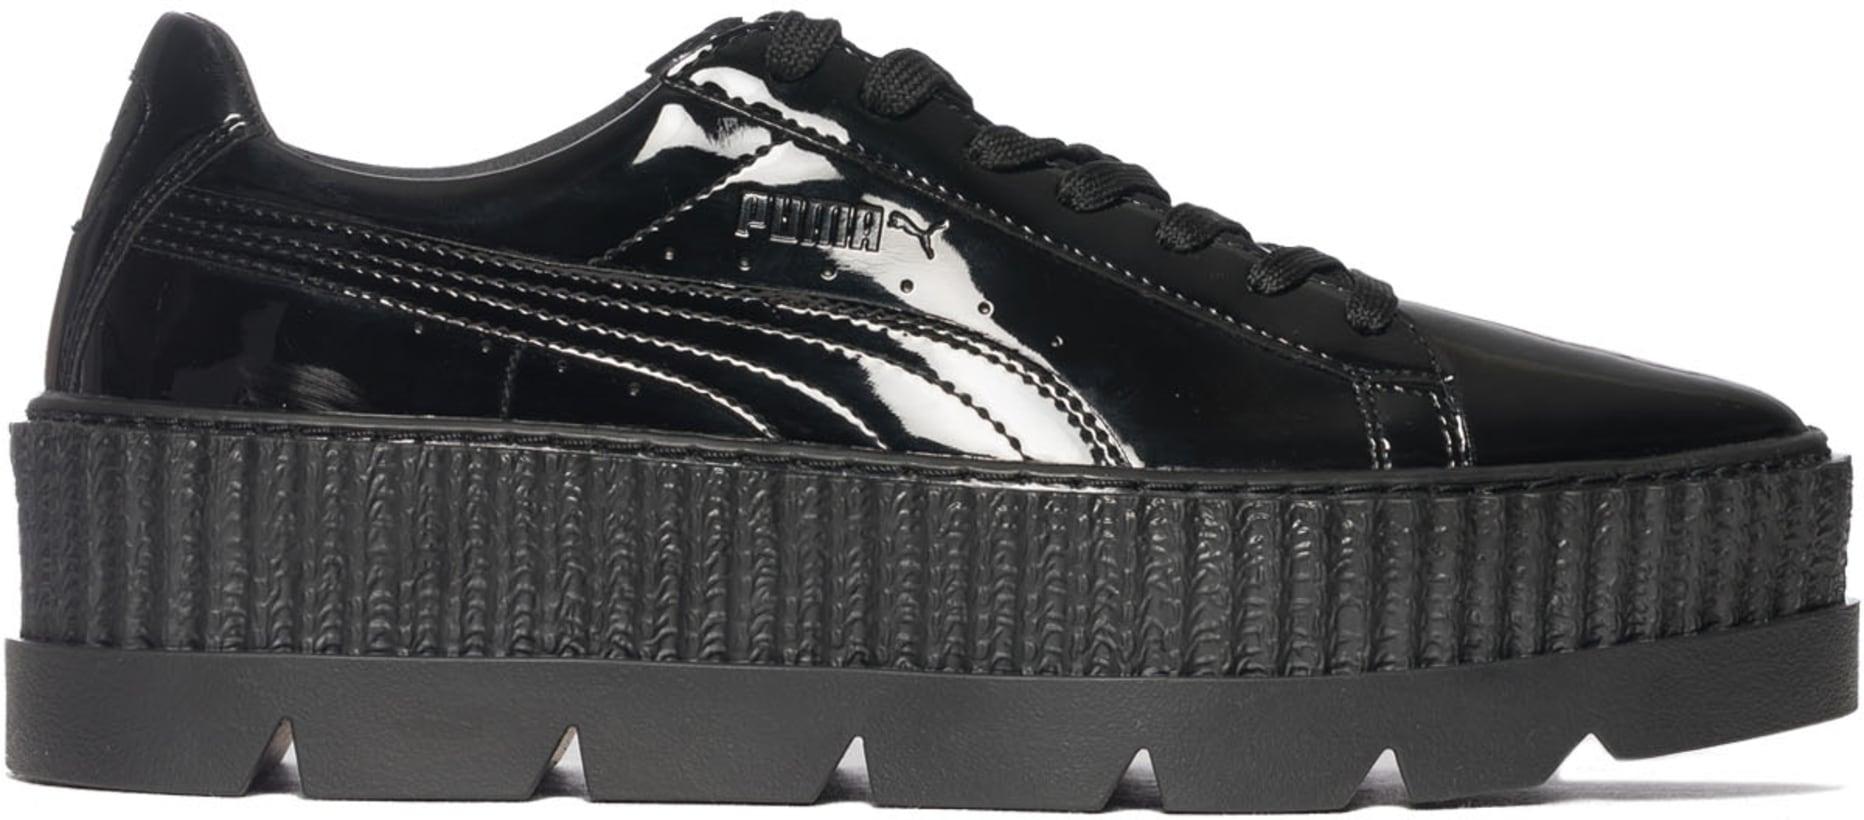 sports shoes 736d8 fcc22 Puma - Fenty Pointy Creeper Patent - Black